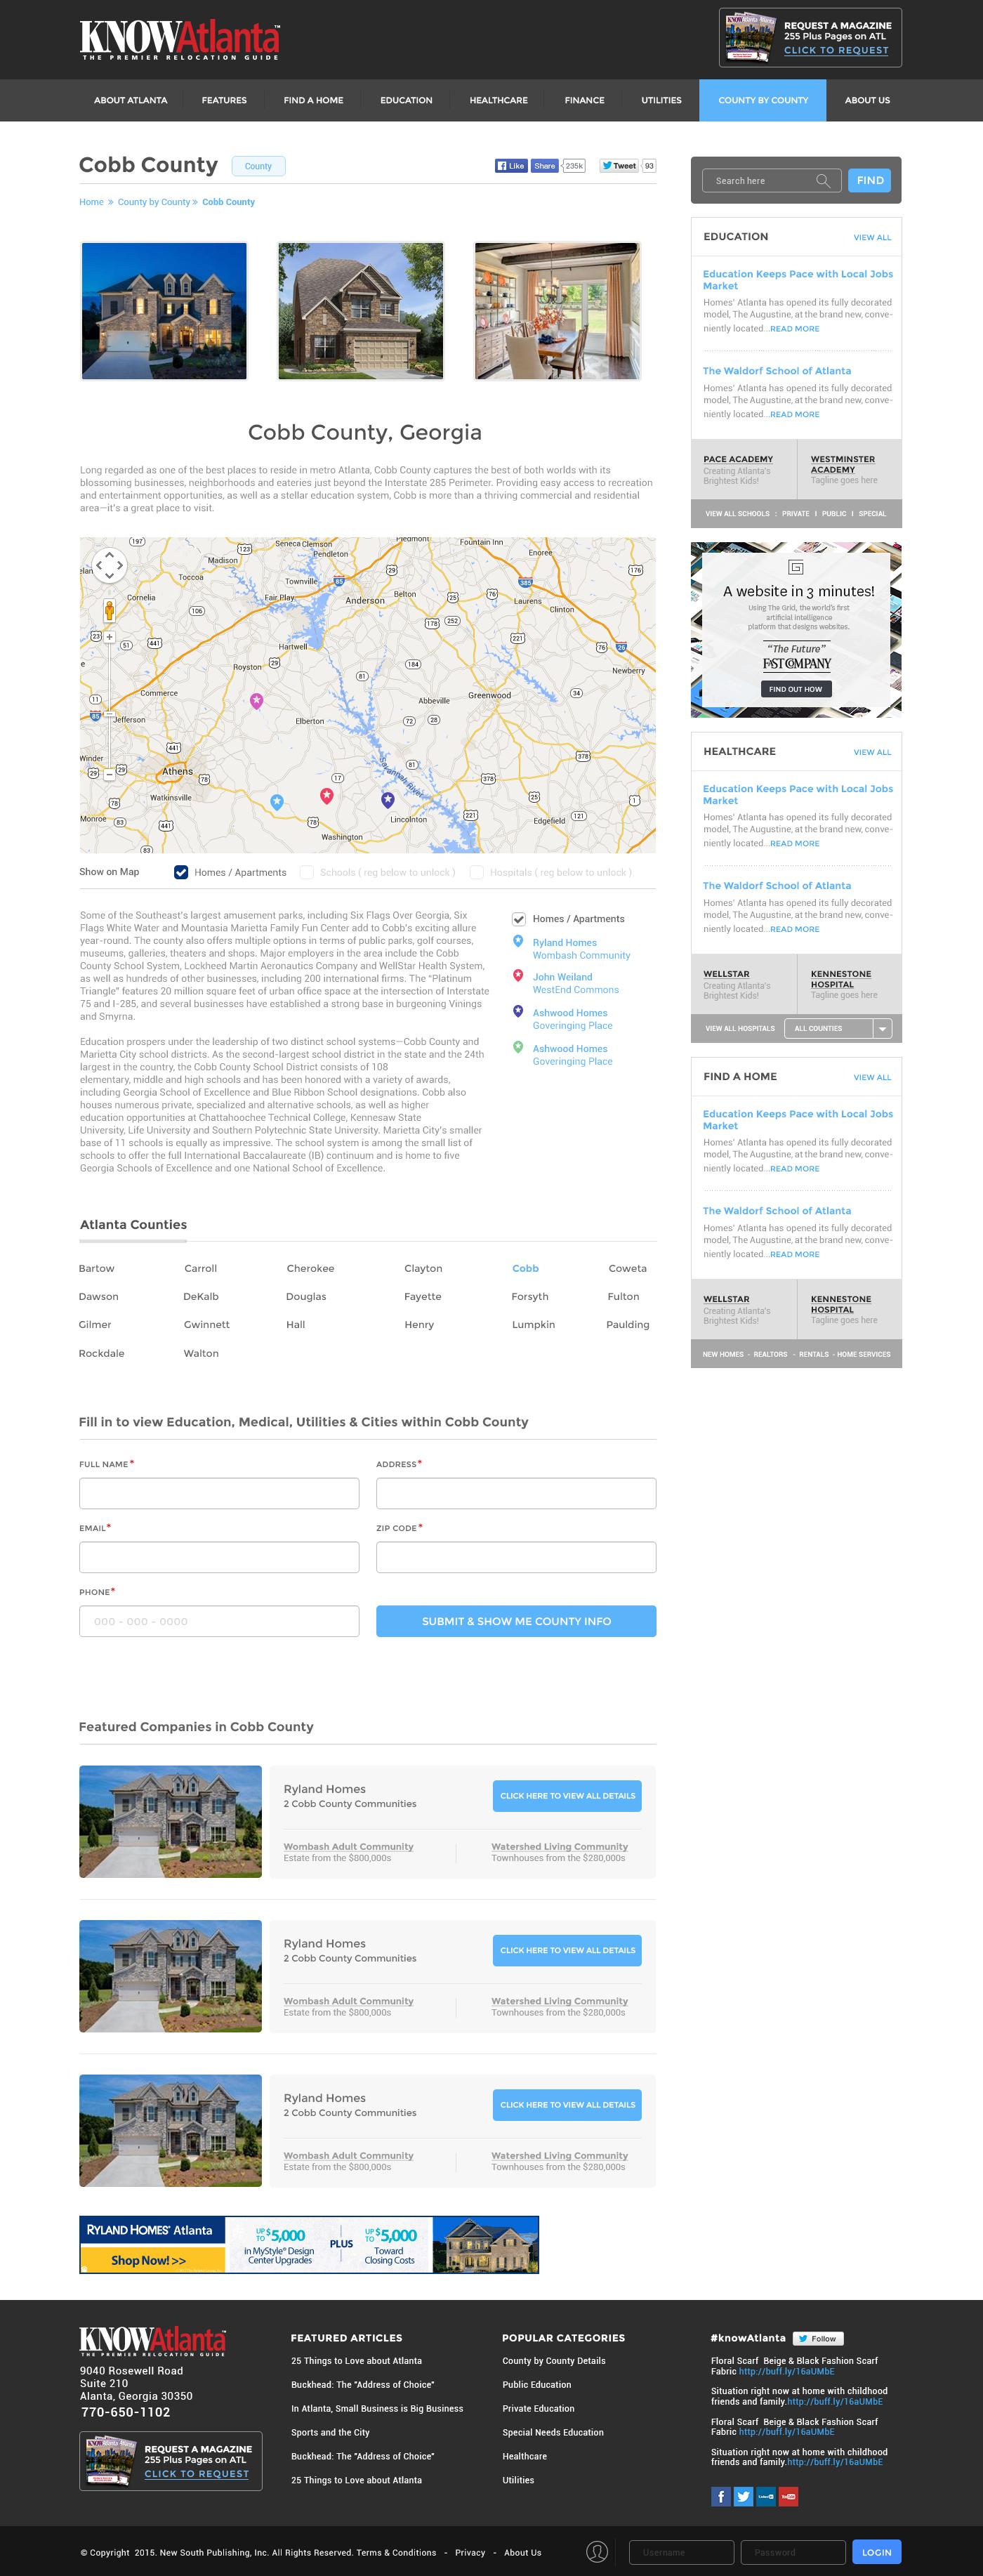 New Site Design - Magazine/Blog - Award Quickly - Fast $ for Best Design!